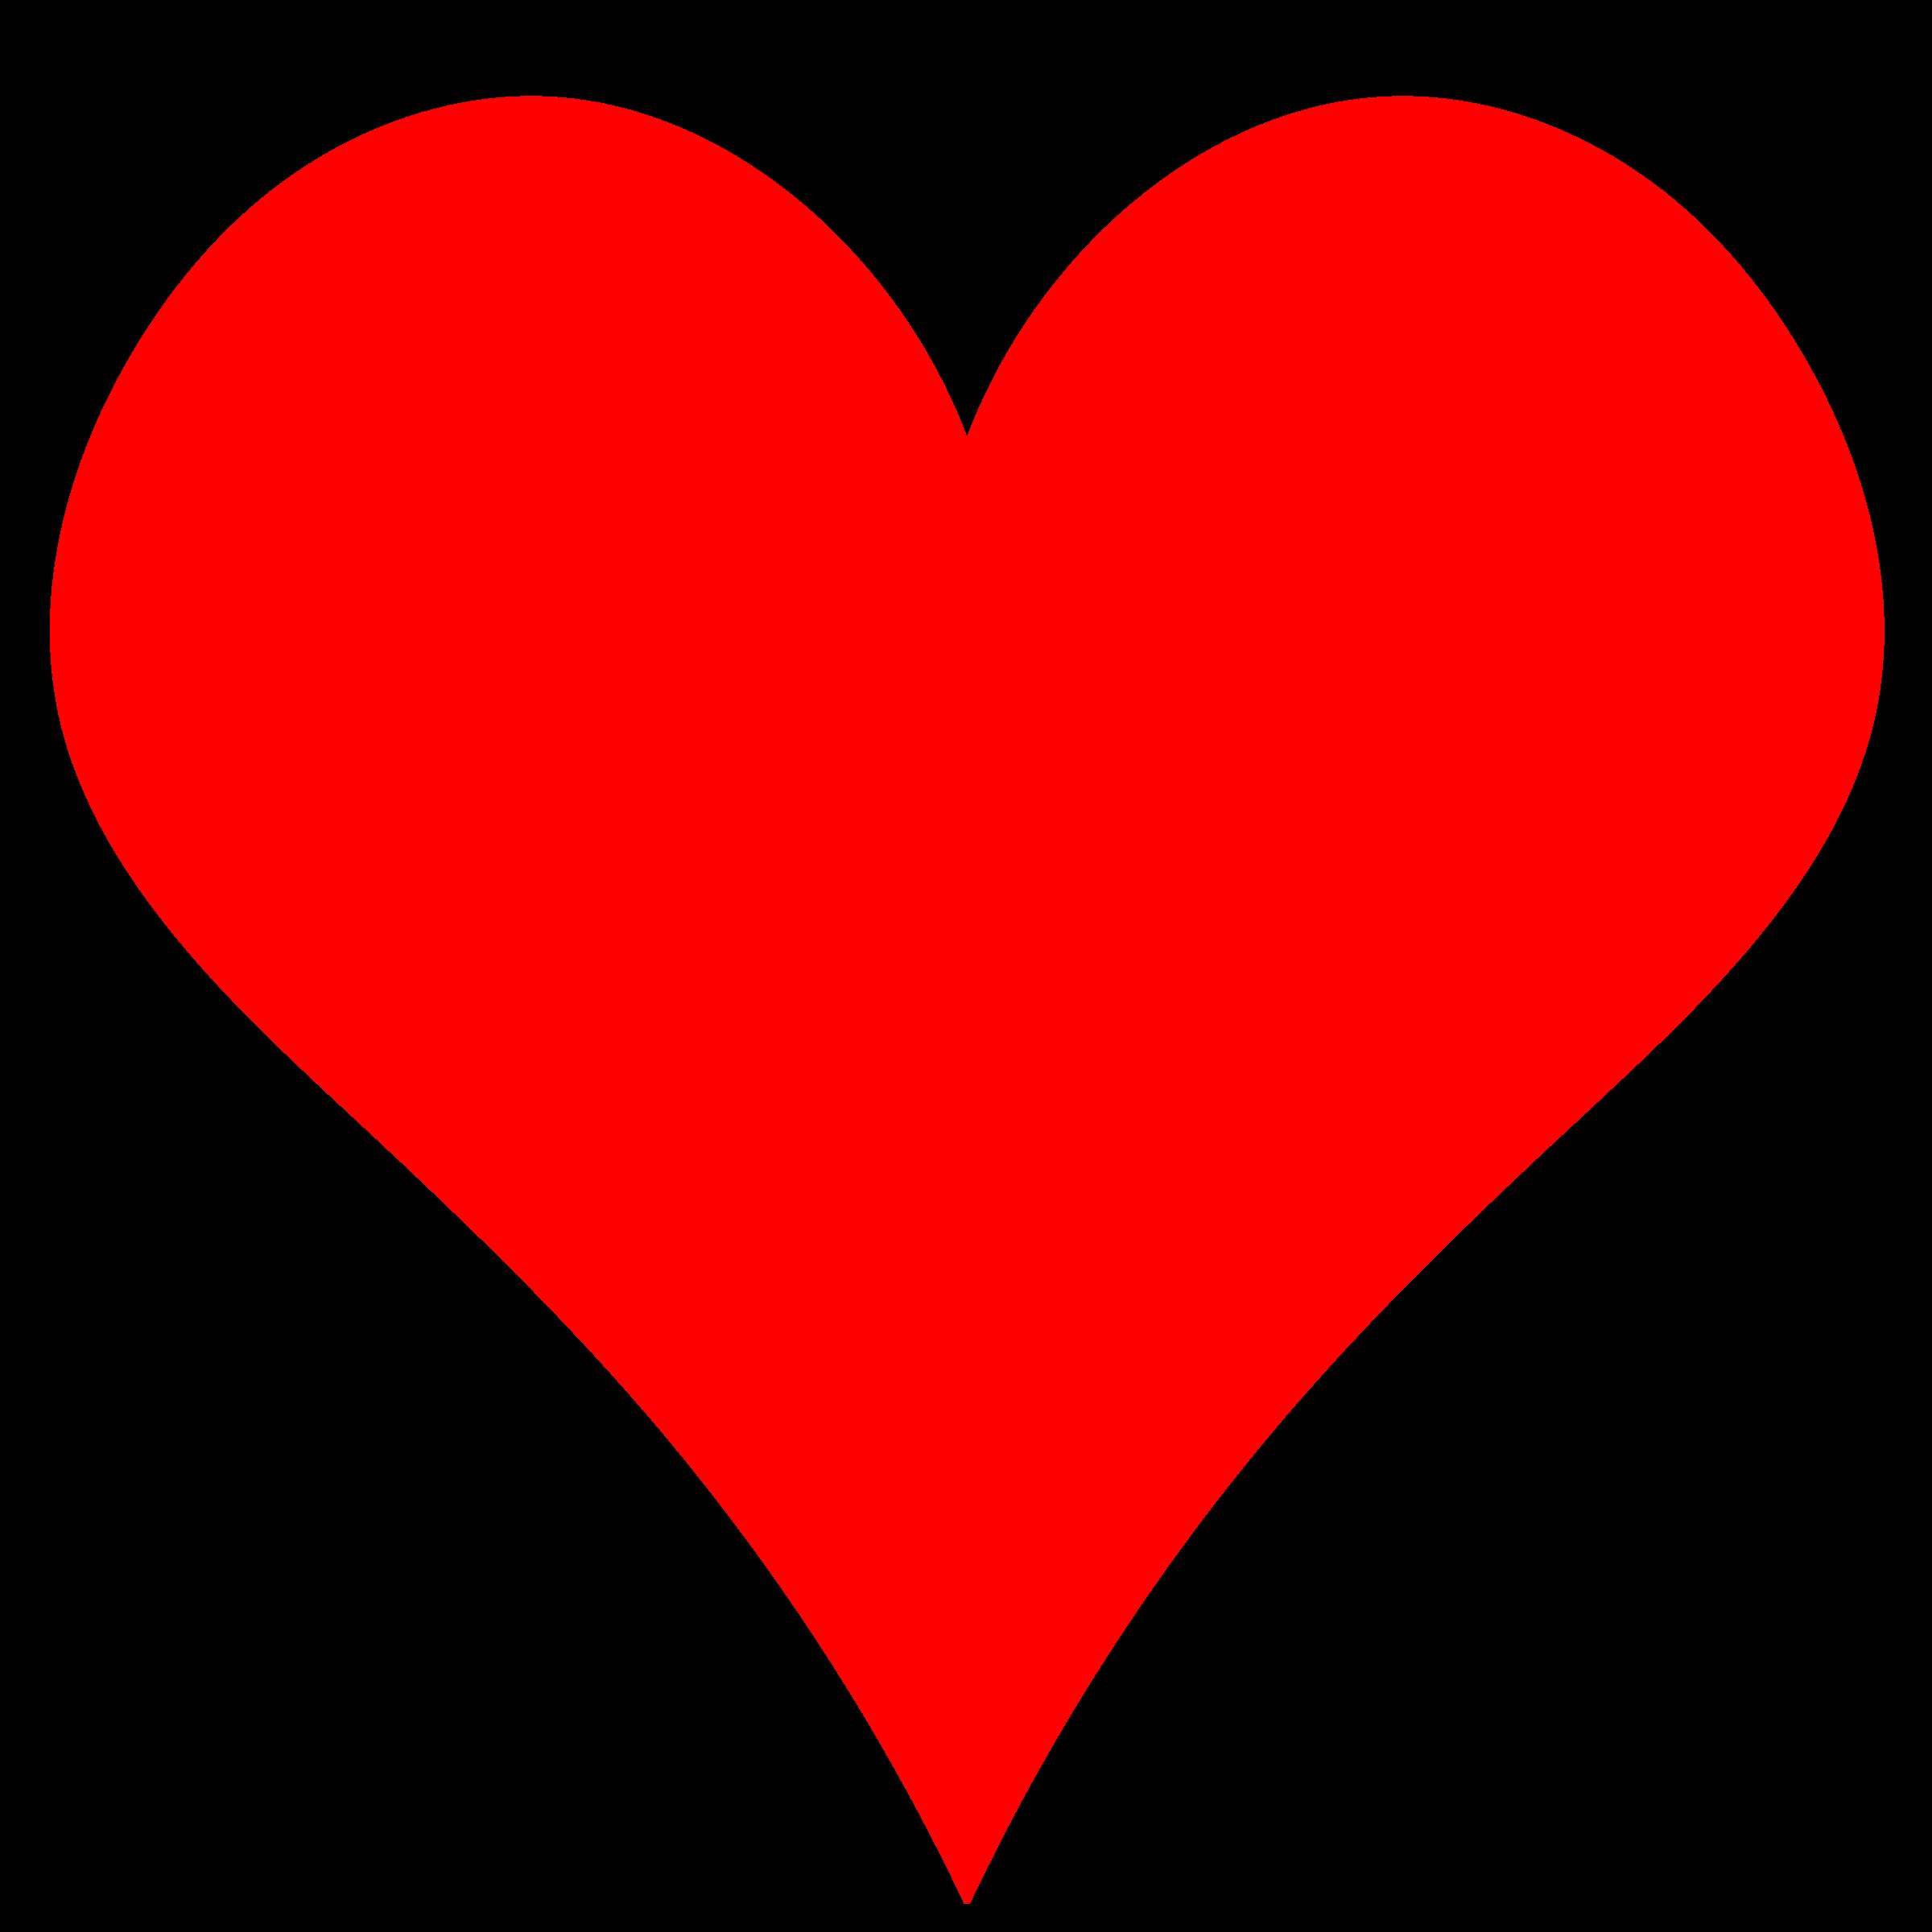 Clip Art Heart Shape Clipart red heart shape clipart kid plain by gr8dan